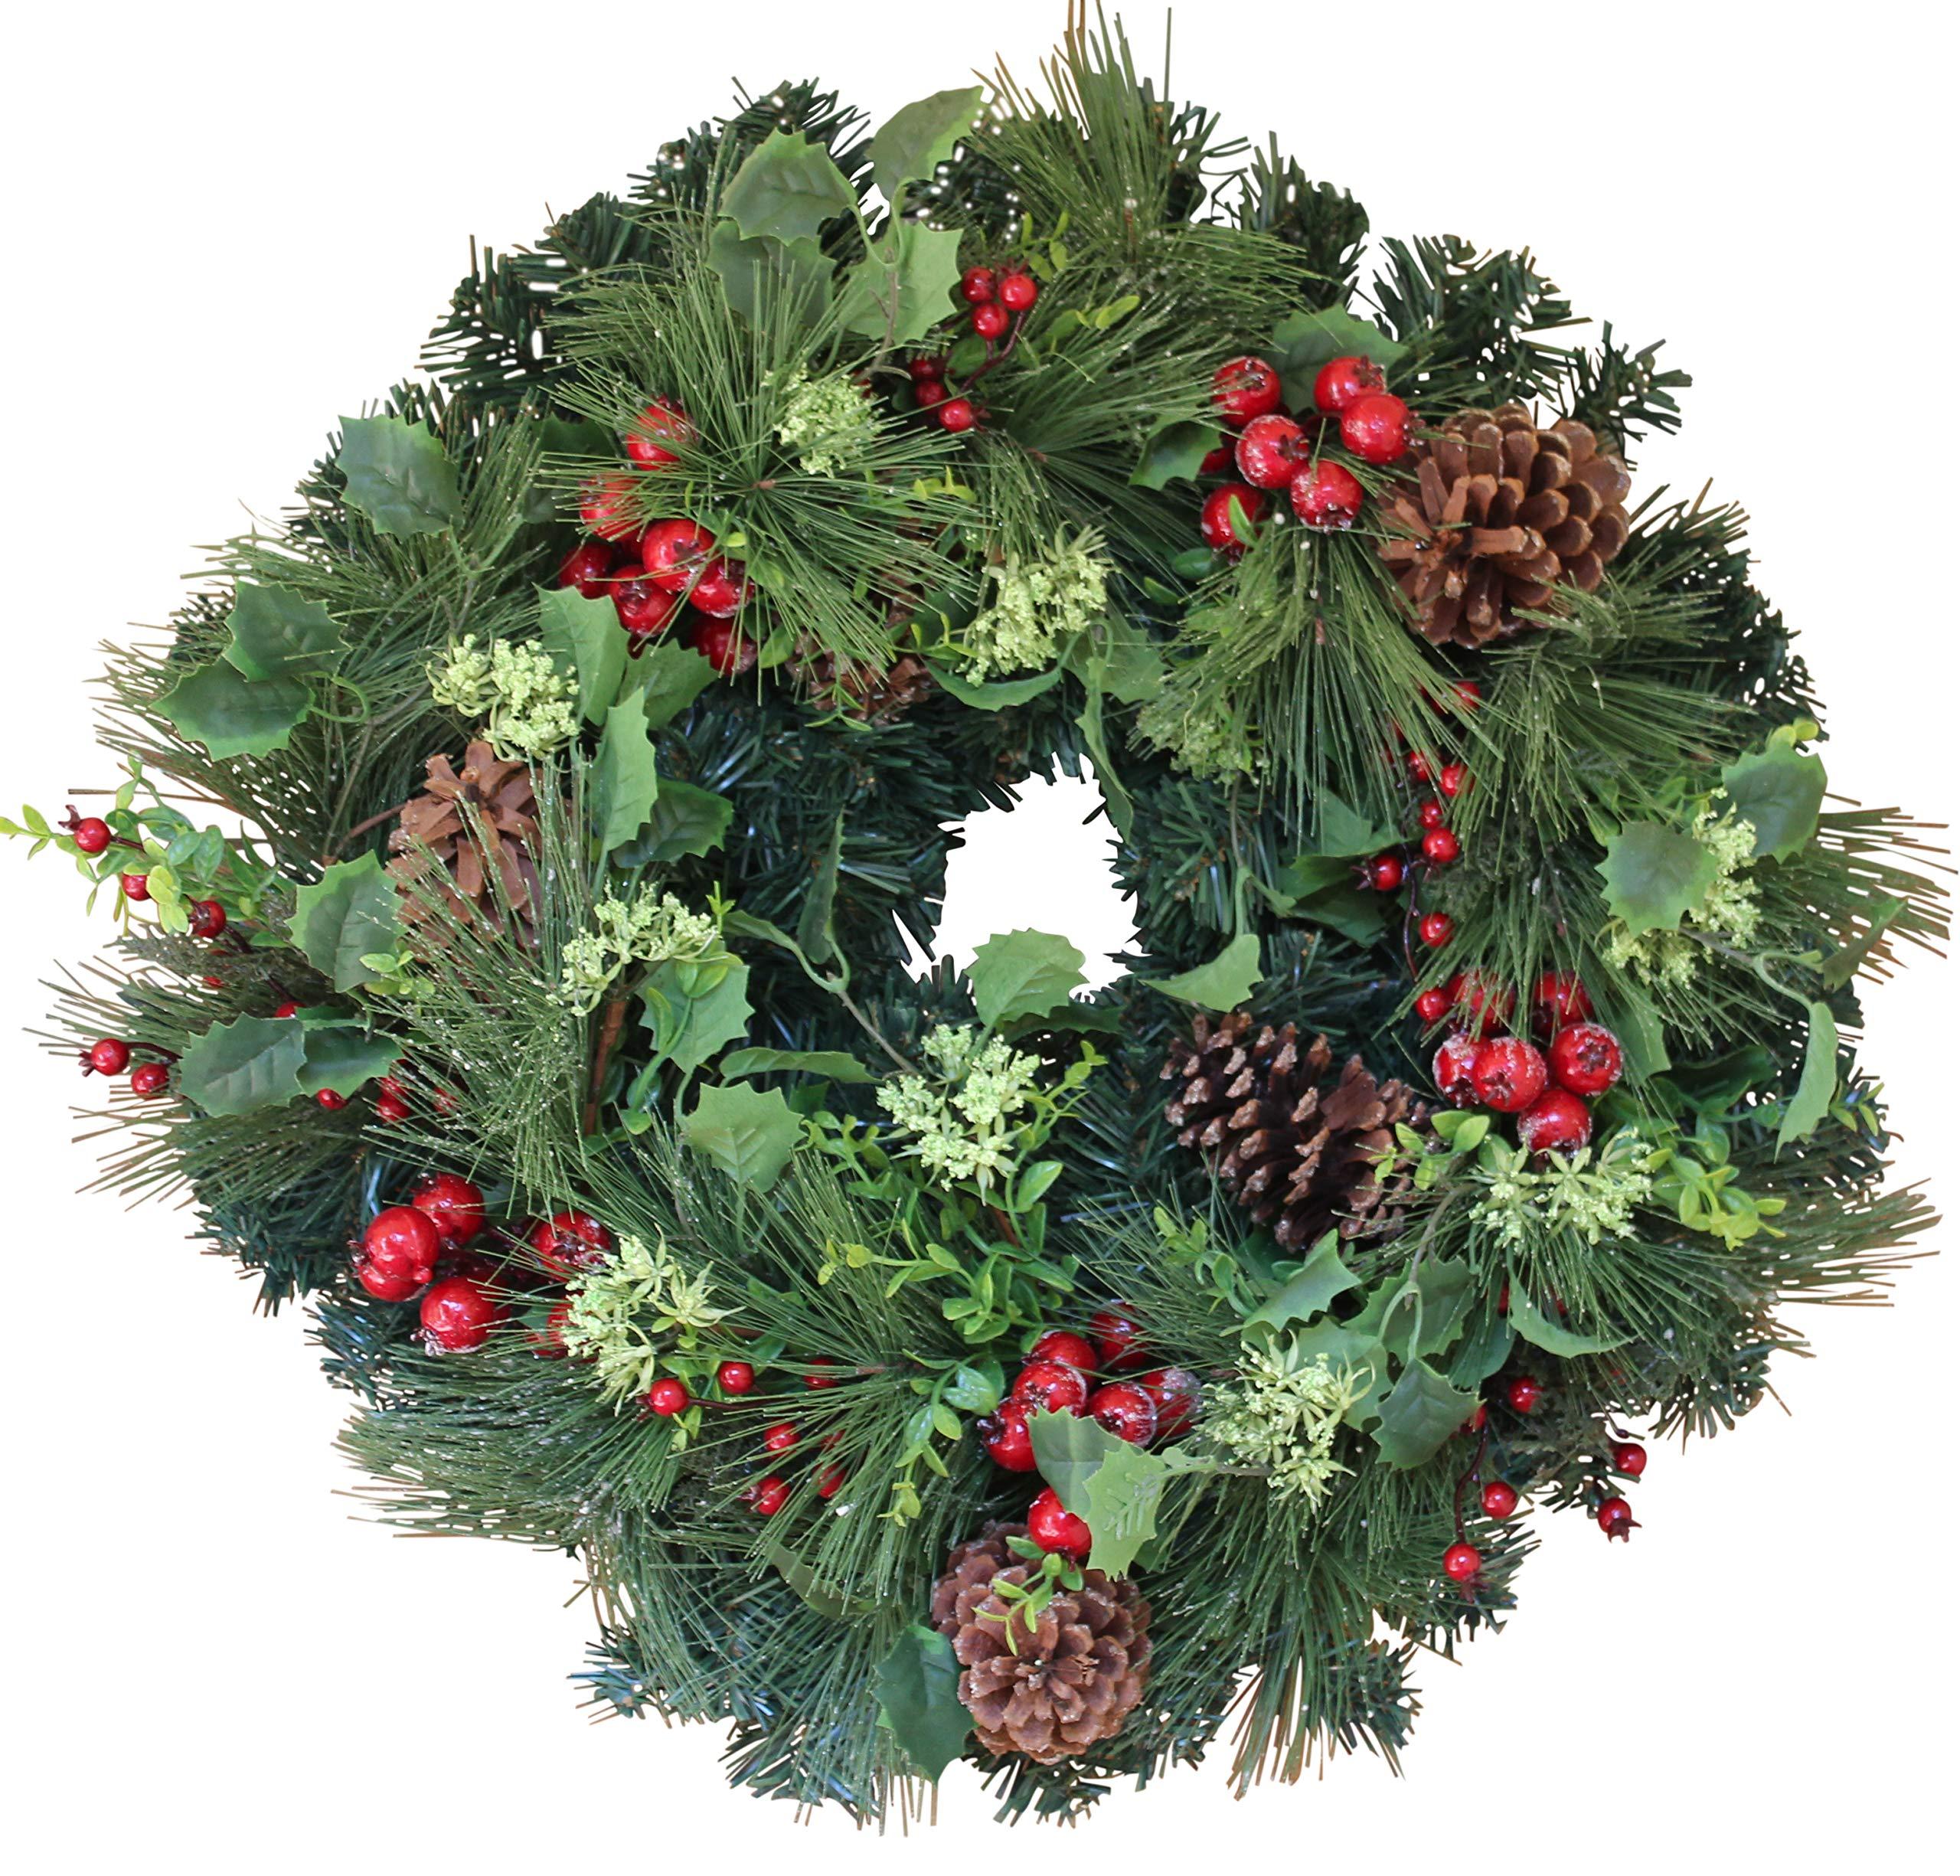 The Wreath Depot Aurora Winter Wreath, 22 Inches, Designer Full Winter Wreath Enhances Front Door Decor, White Gift Box Included